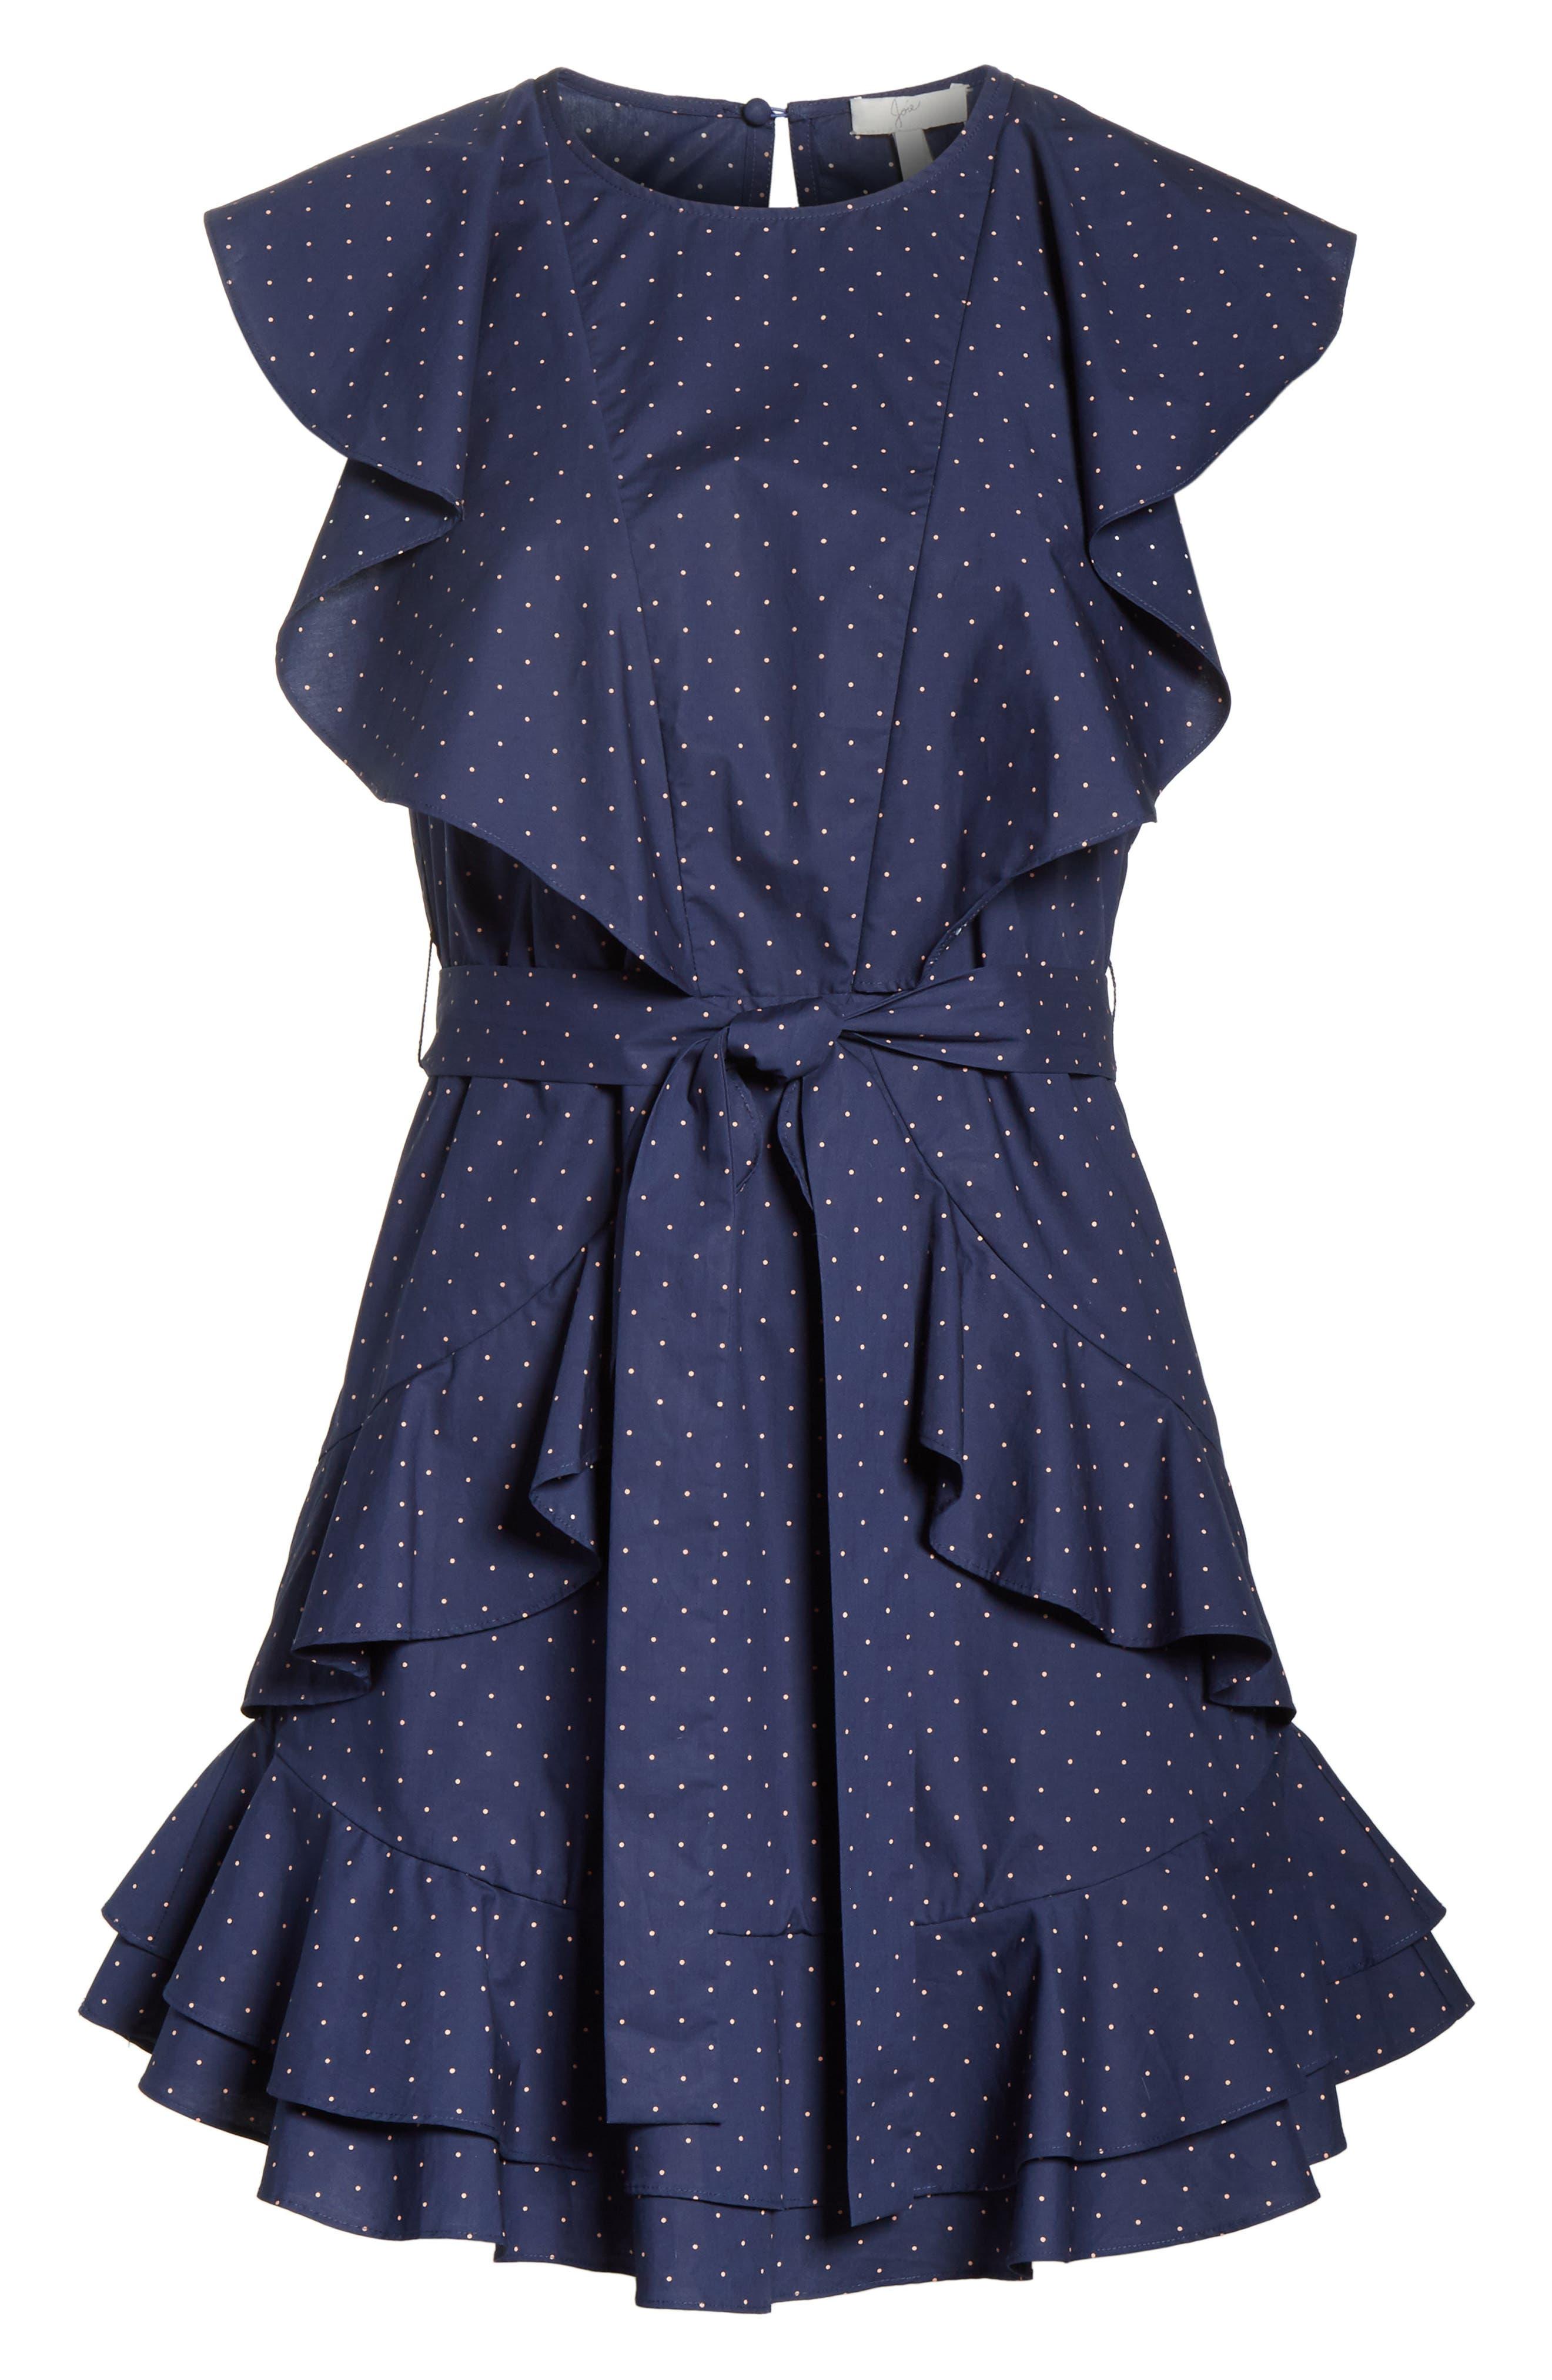 Malachy Ruffle Dot Cotton Dress,                             Alternate thumbnail 6, color,